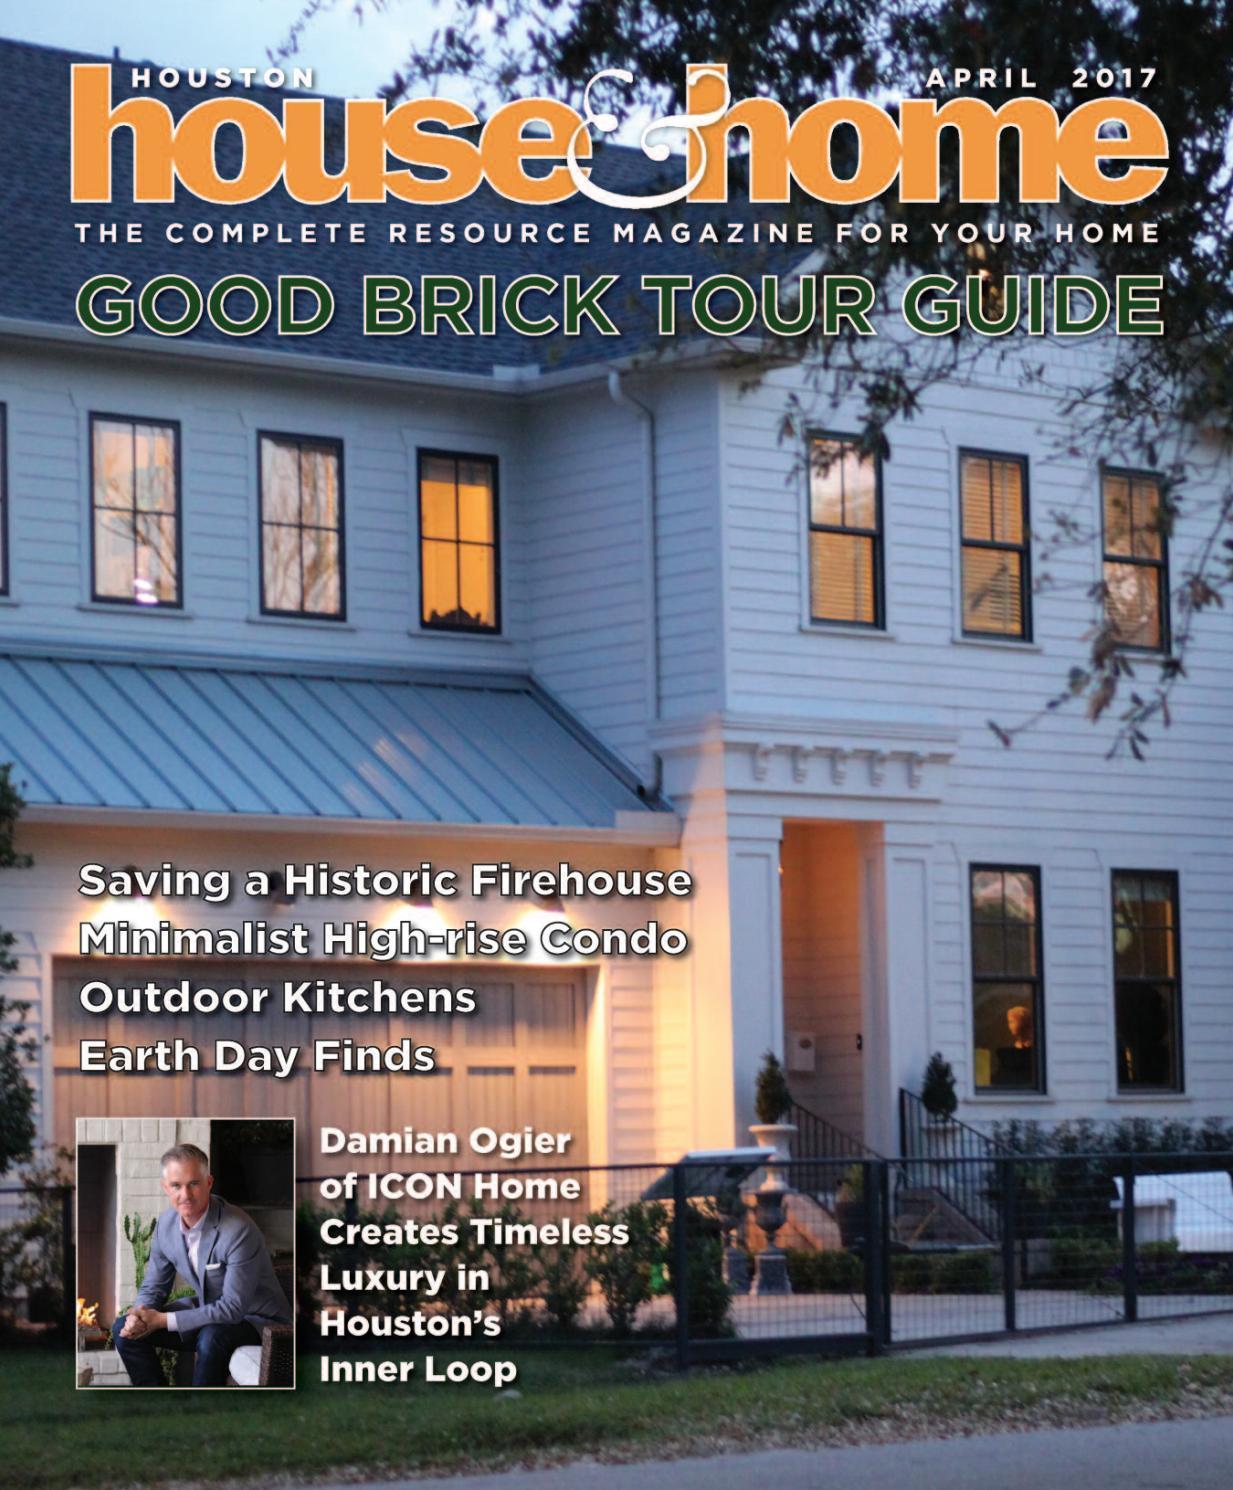 0417 houhousehome vir by Houston House & Home Magazine - issuu